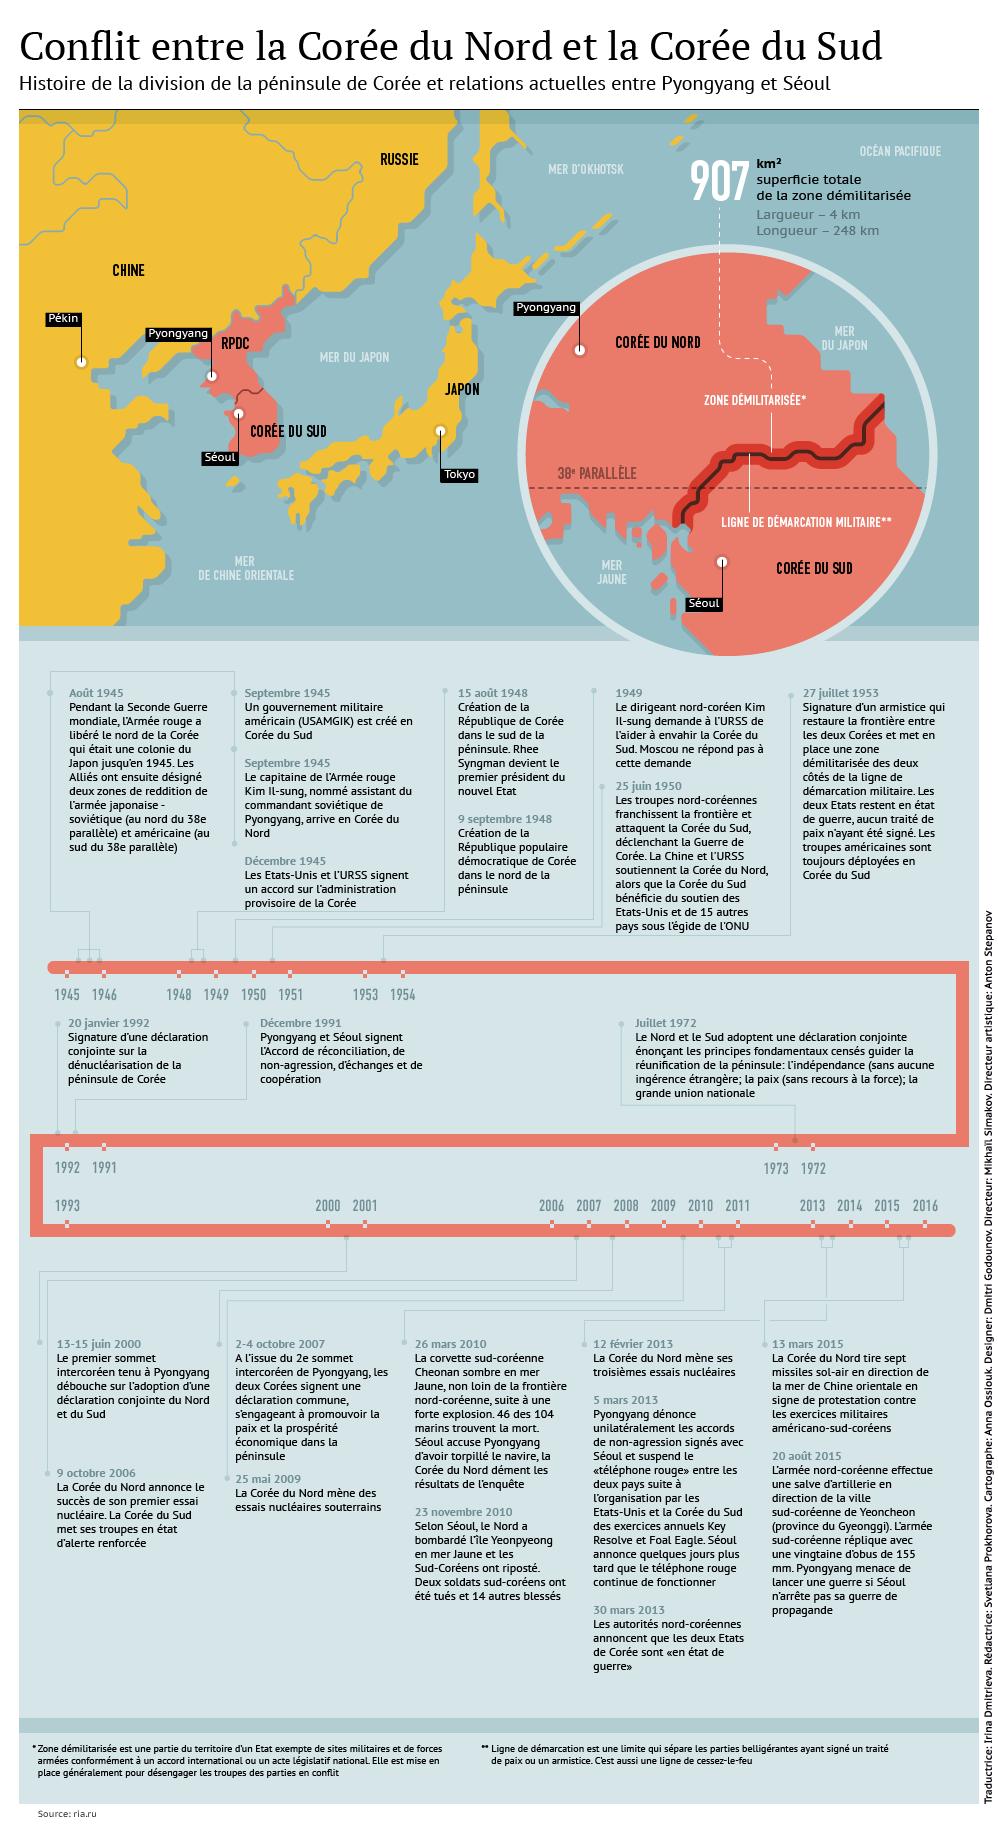 Ni guerre, ni paix: 70 ans de tensions sur la péninsule de Corée